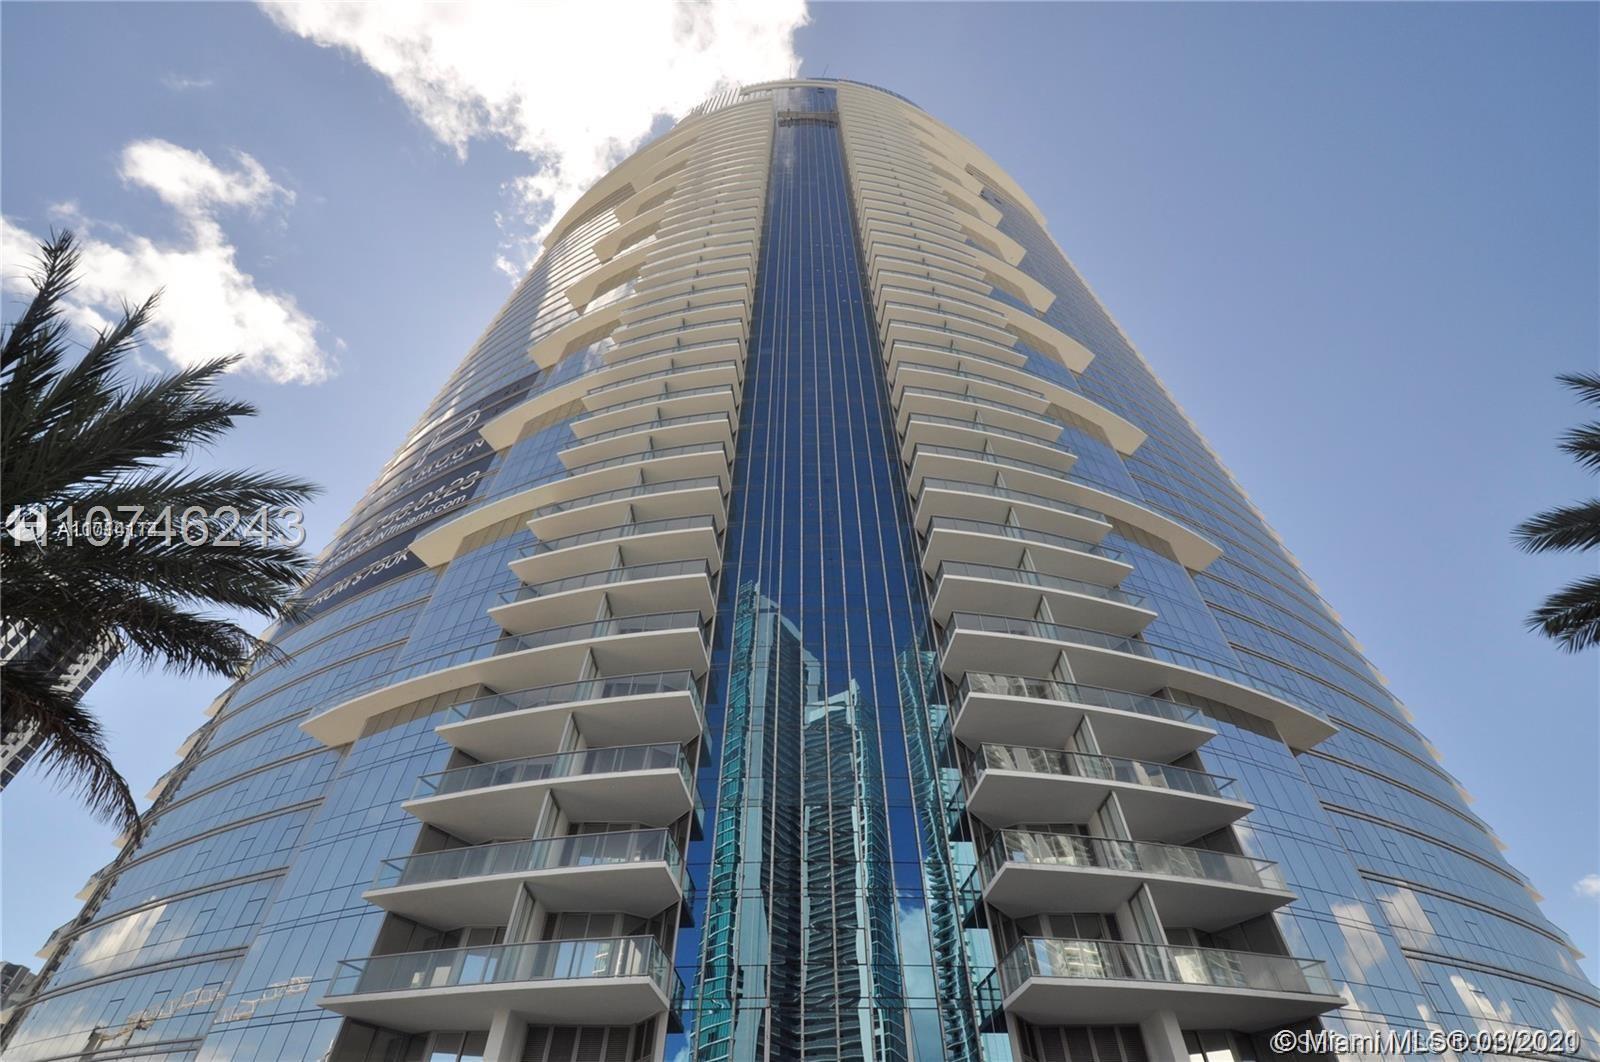 Paramount Miami Worldcenter #5006 - 851 NE 1st Ave #5006, Miami, FL 33132